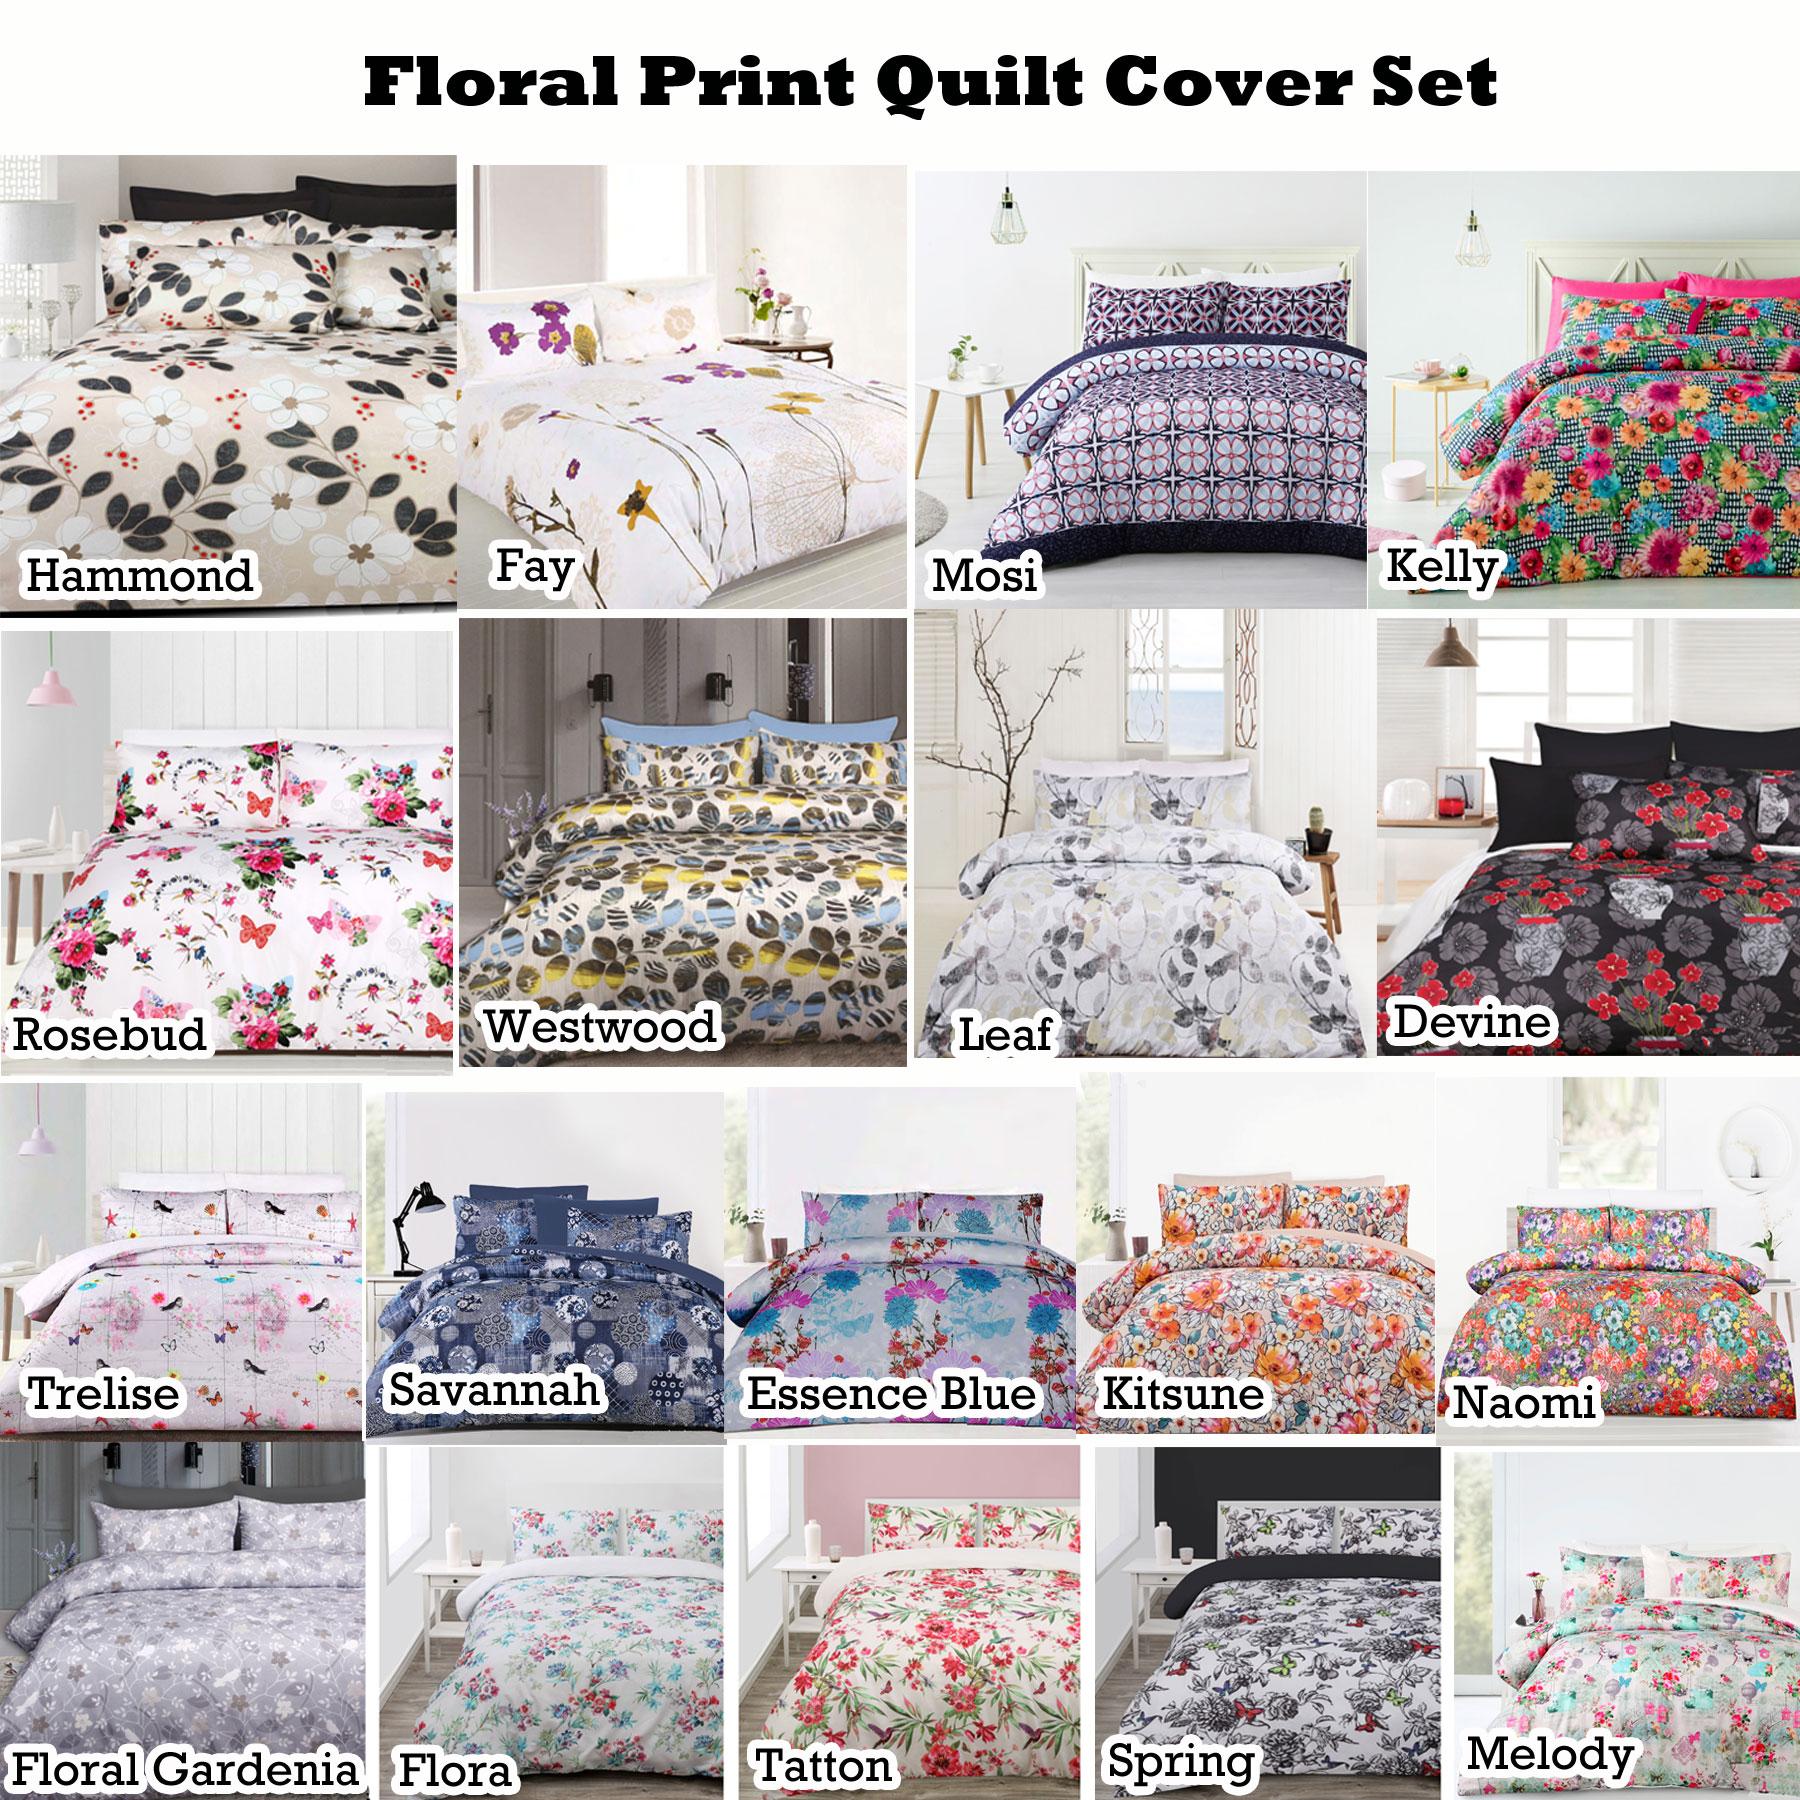 Big Sleep 3 Pce Printed Soft Feel Quilt Doona Duvet Cover Set DOUBLE QUEEN KING